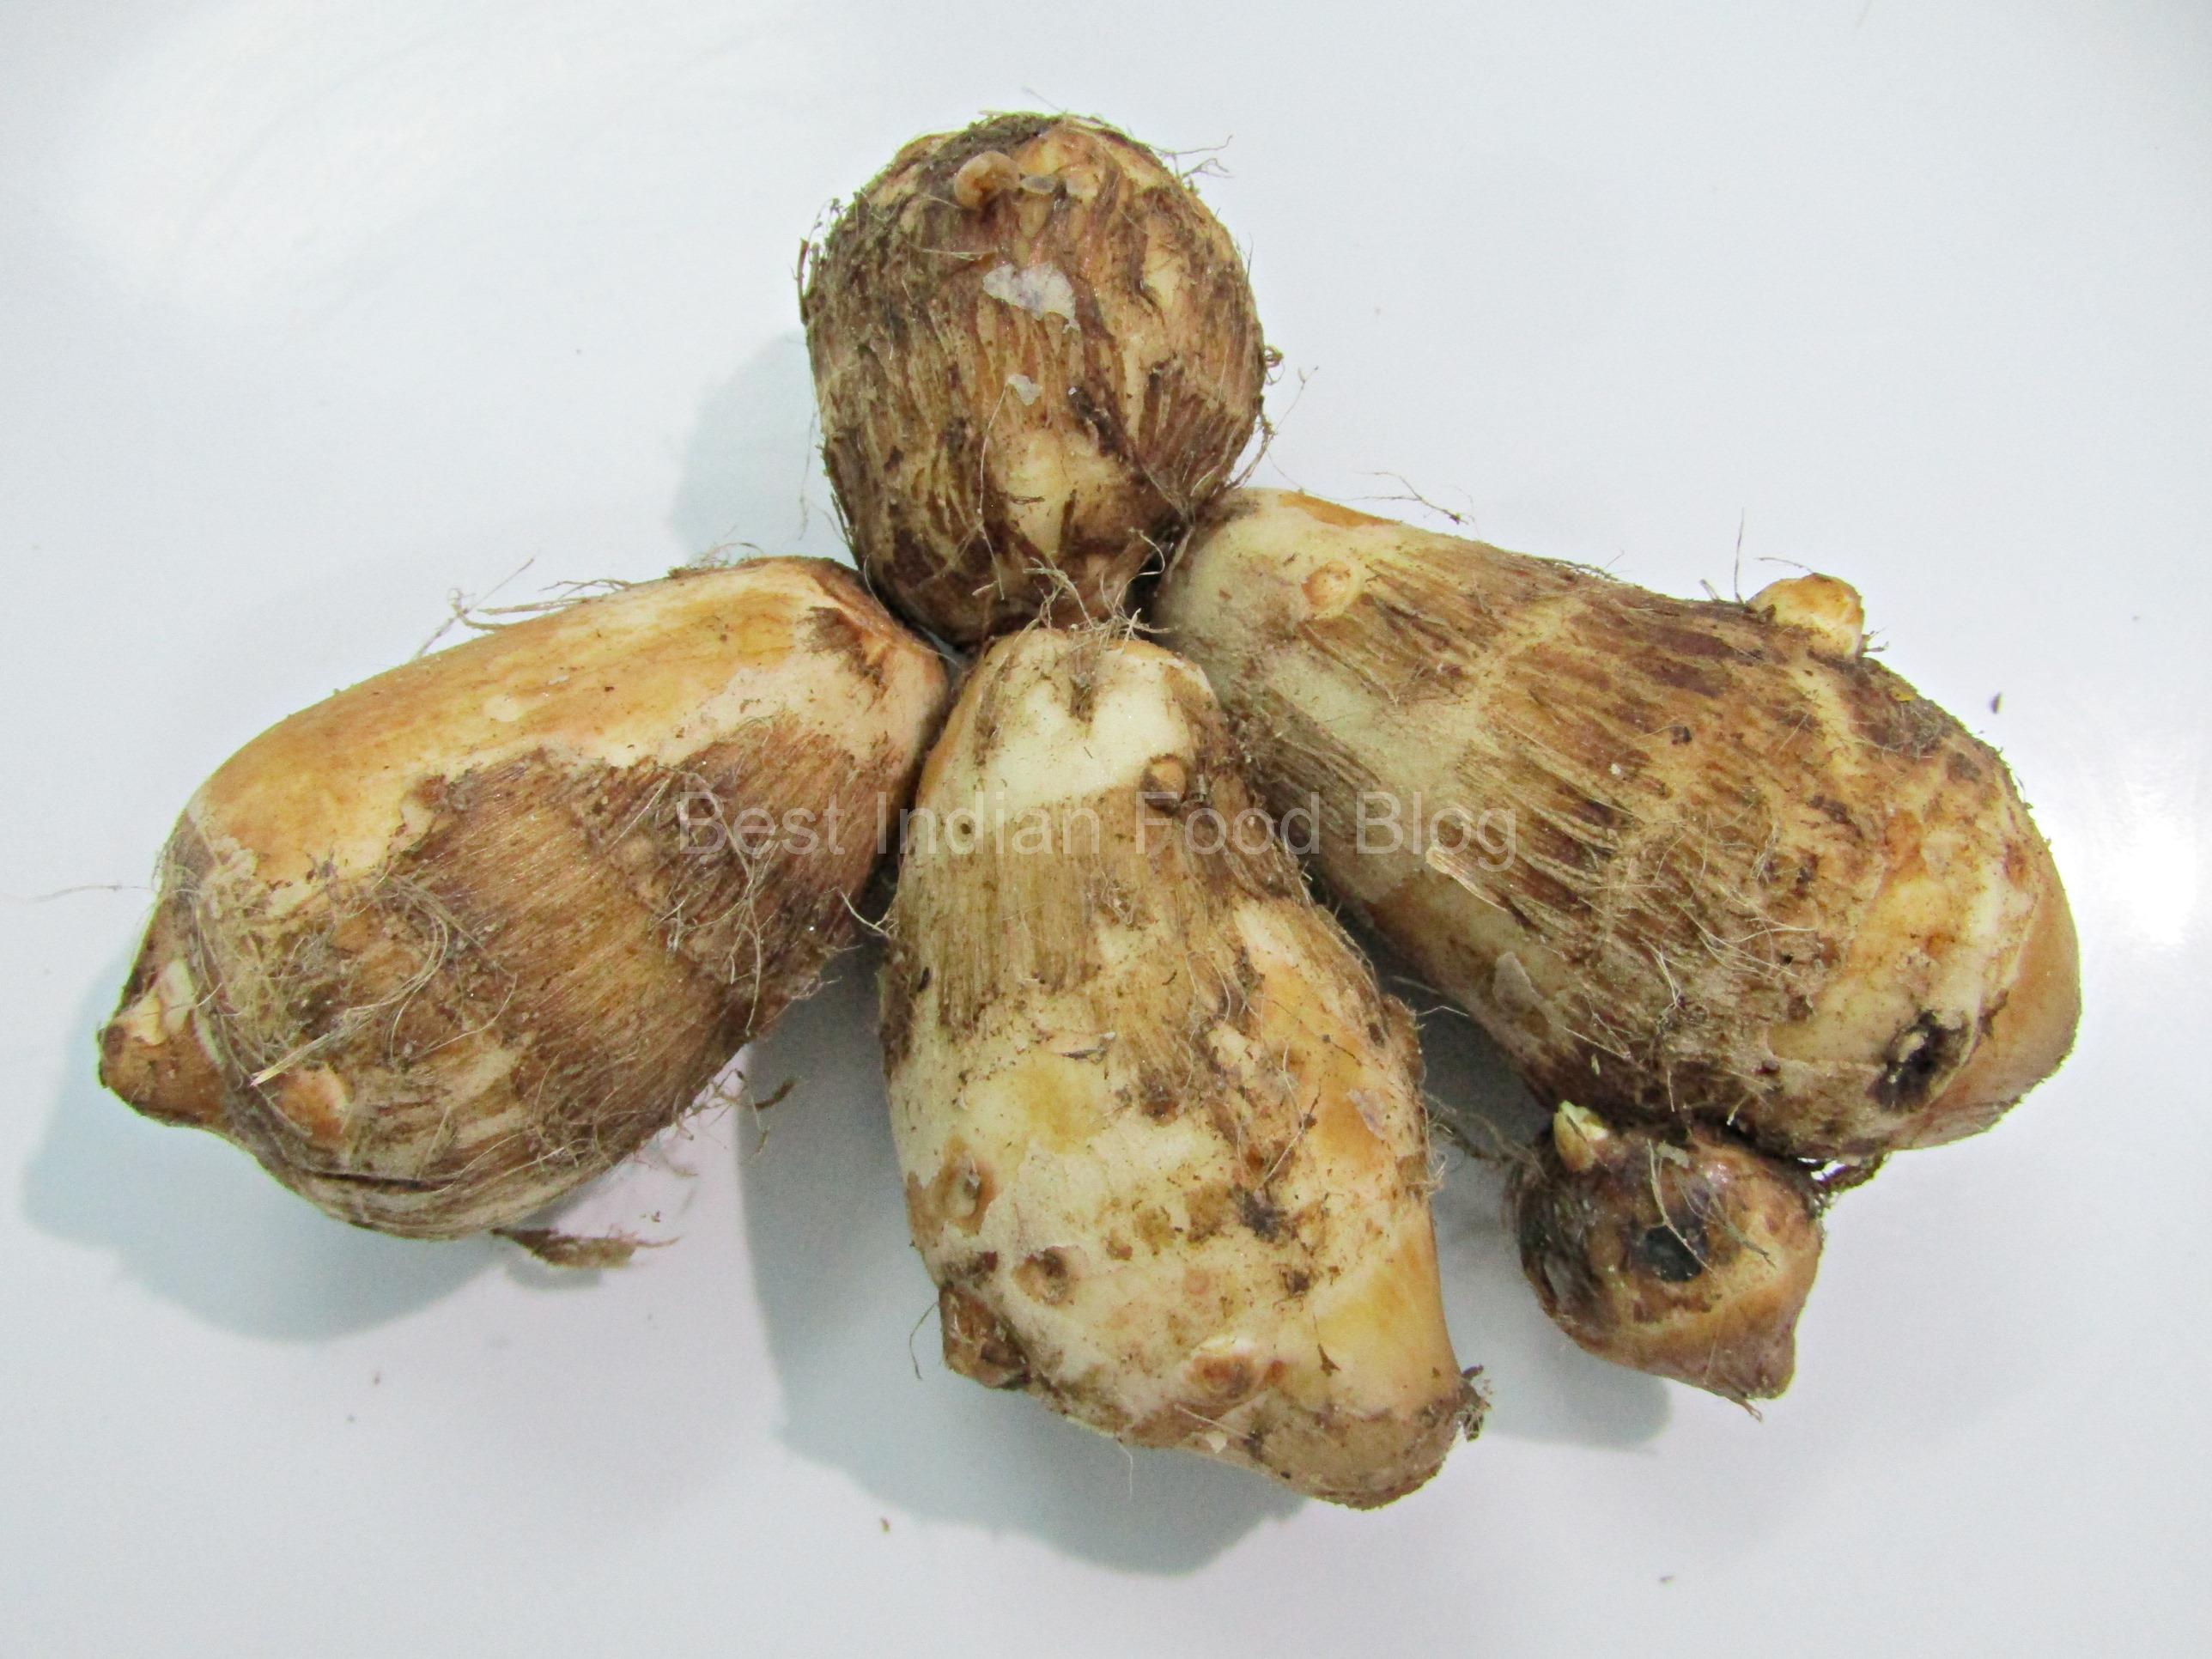 Taro corms